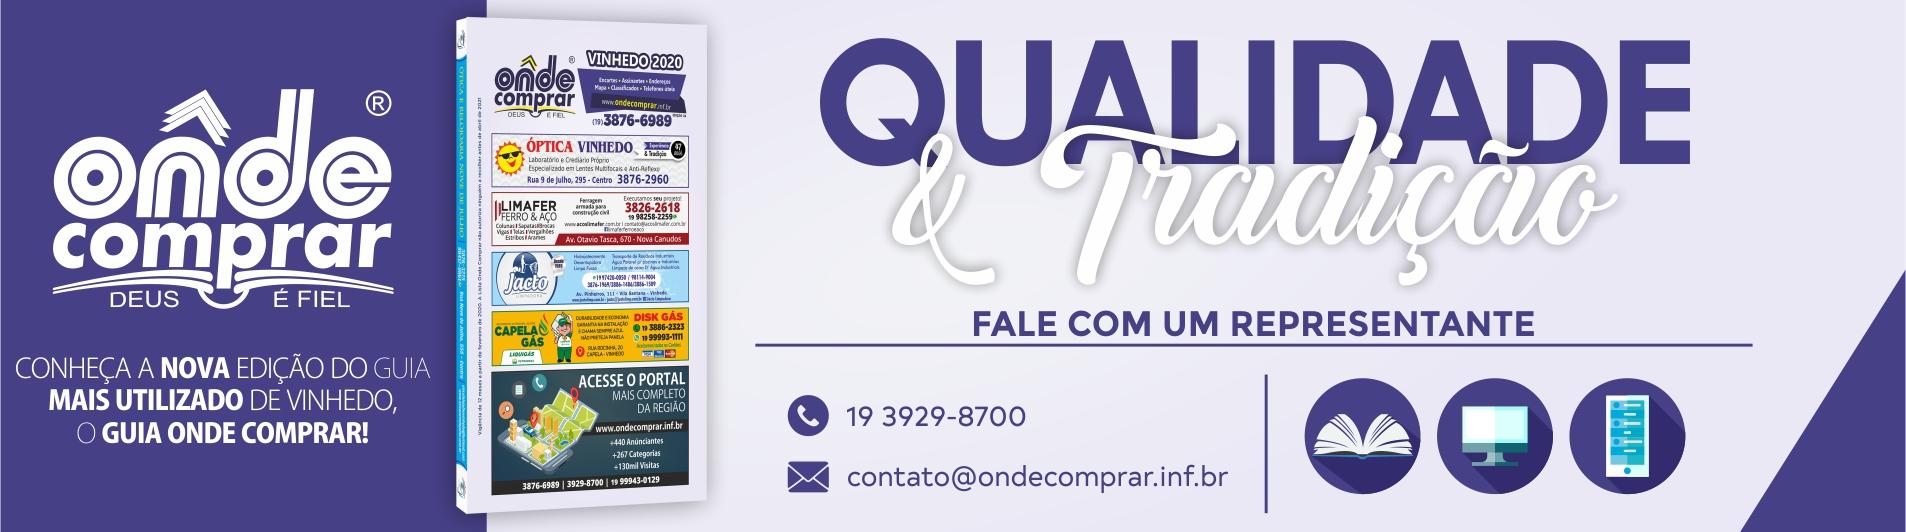 ONDE-COMPRAR-VINHEDO-2020